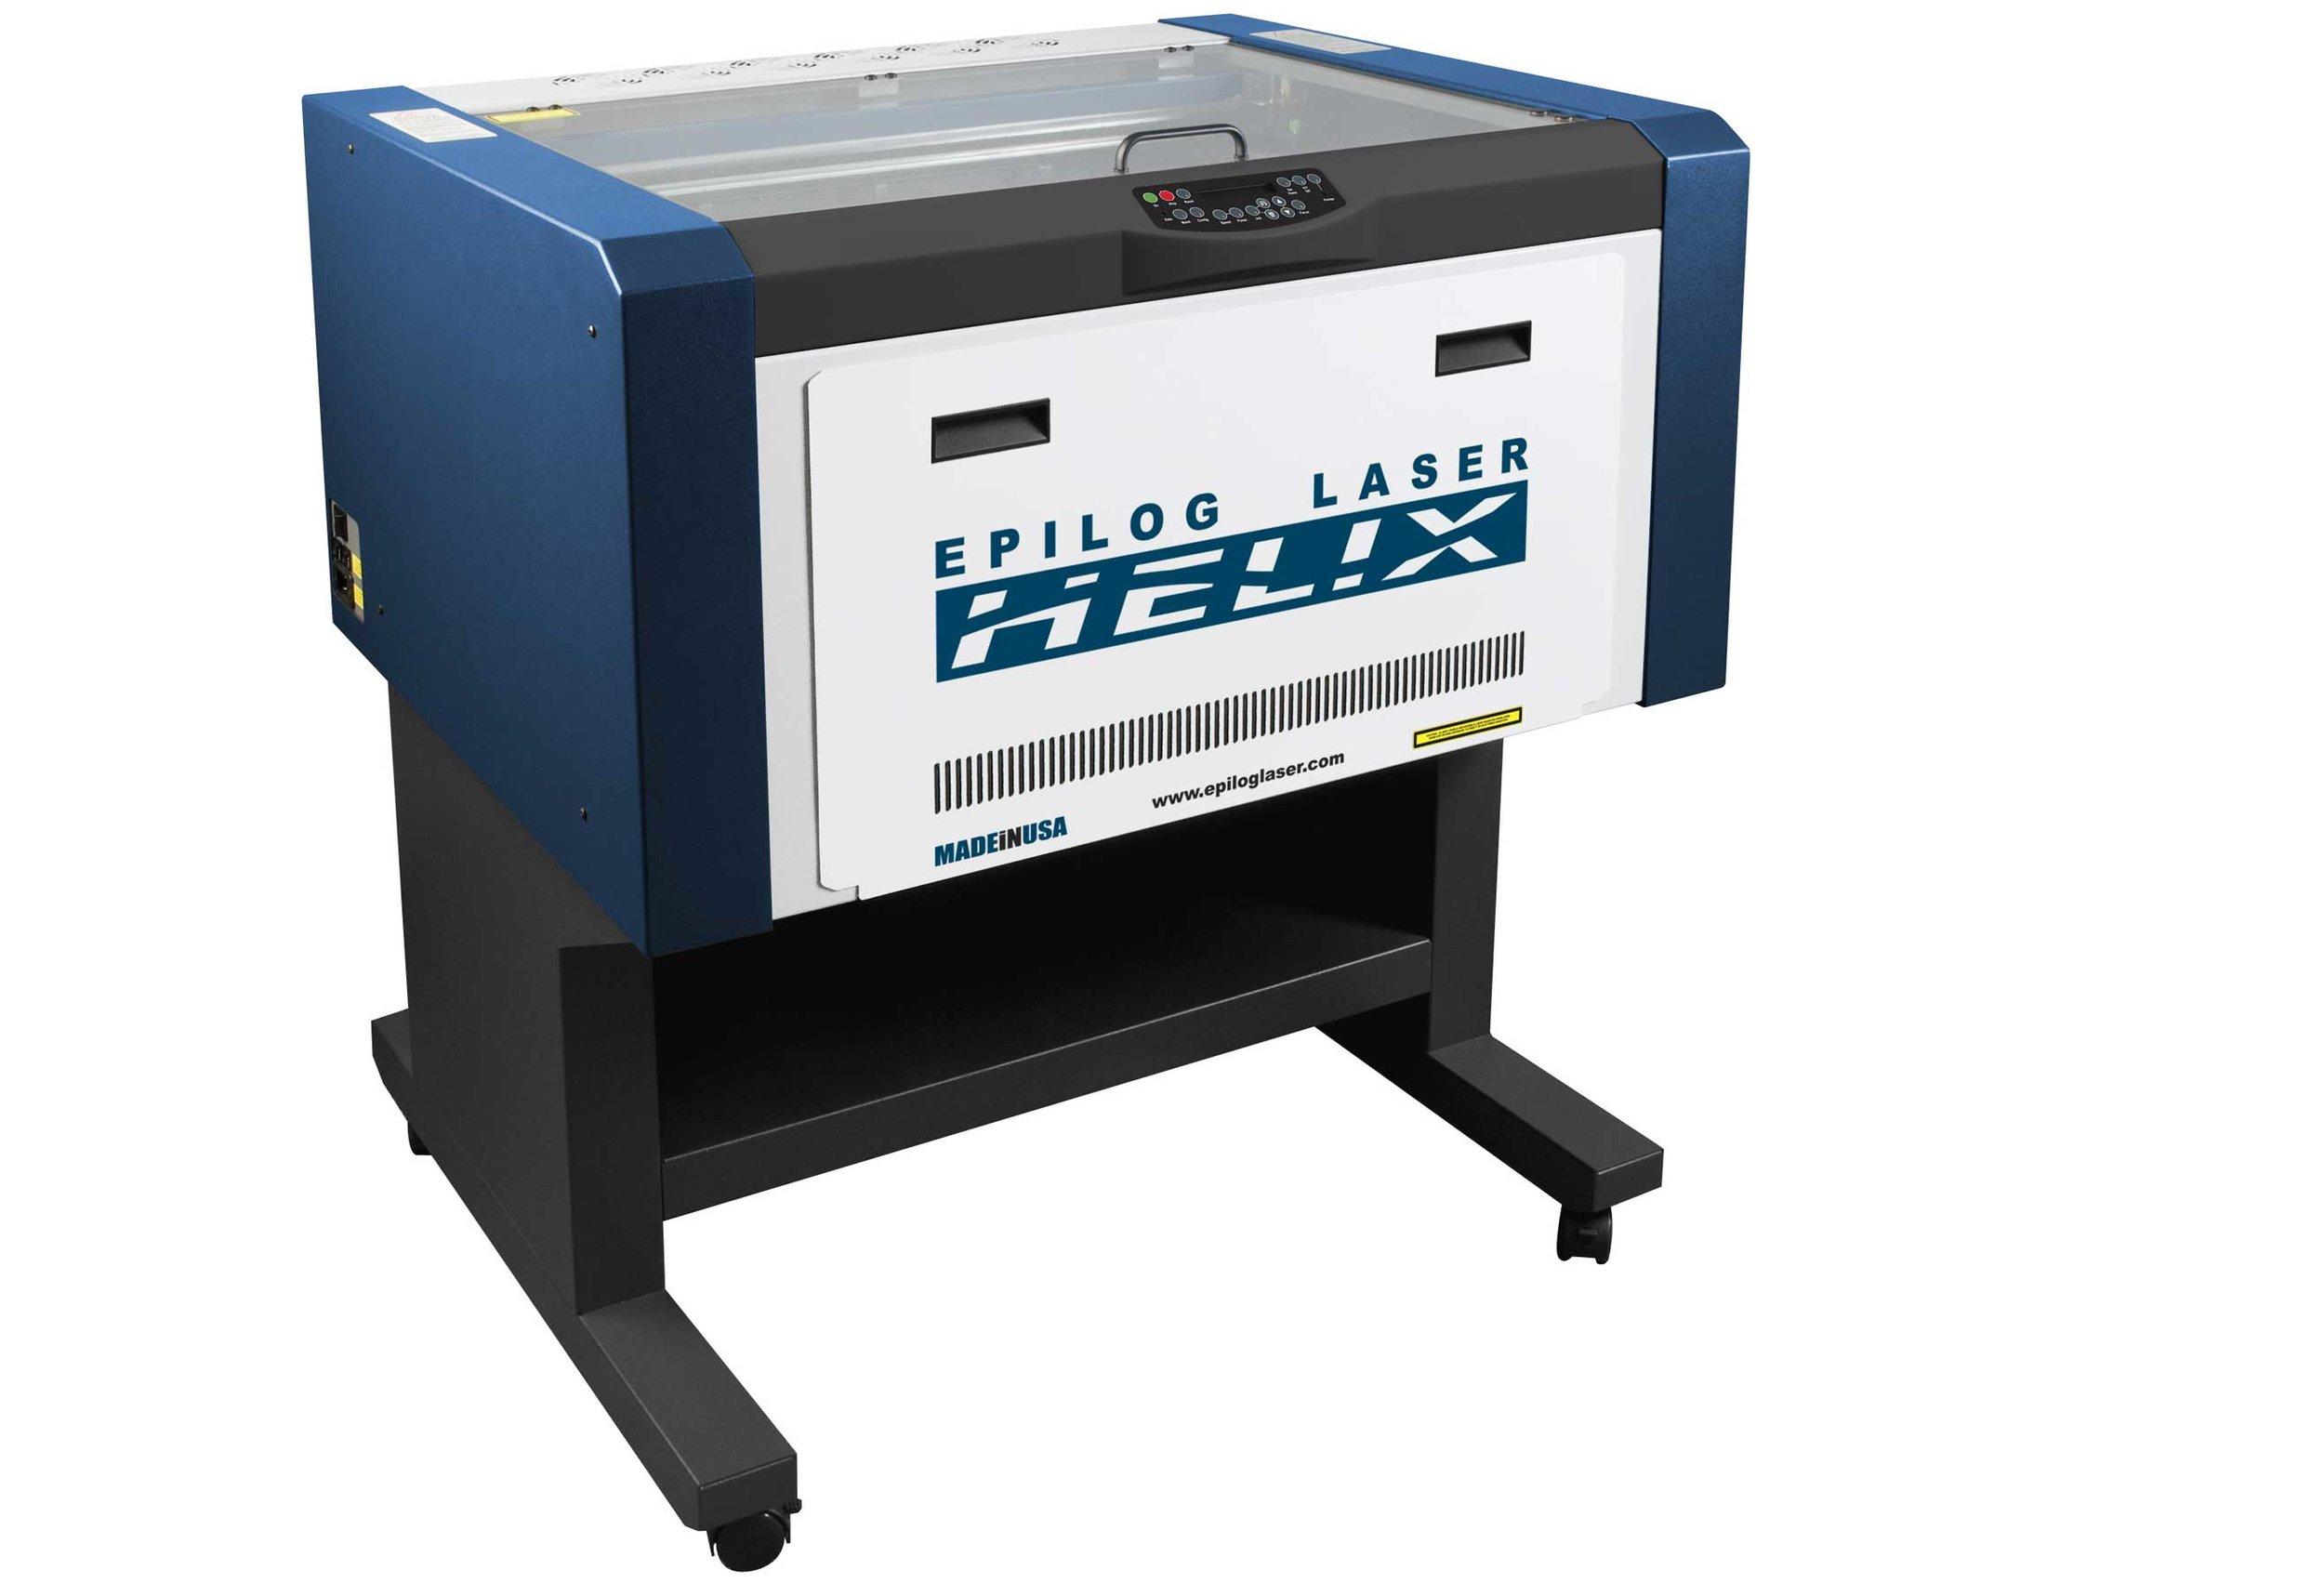 Epilog Helix 24 Laser.jpg